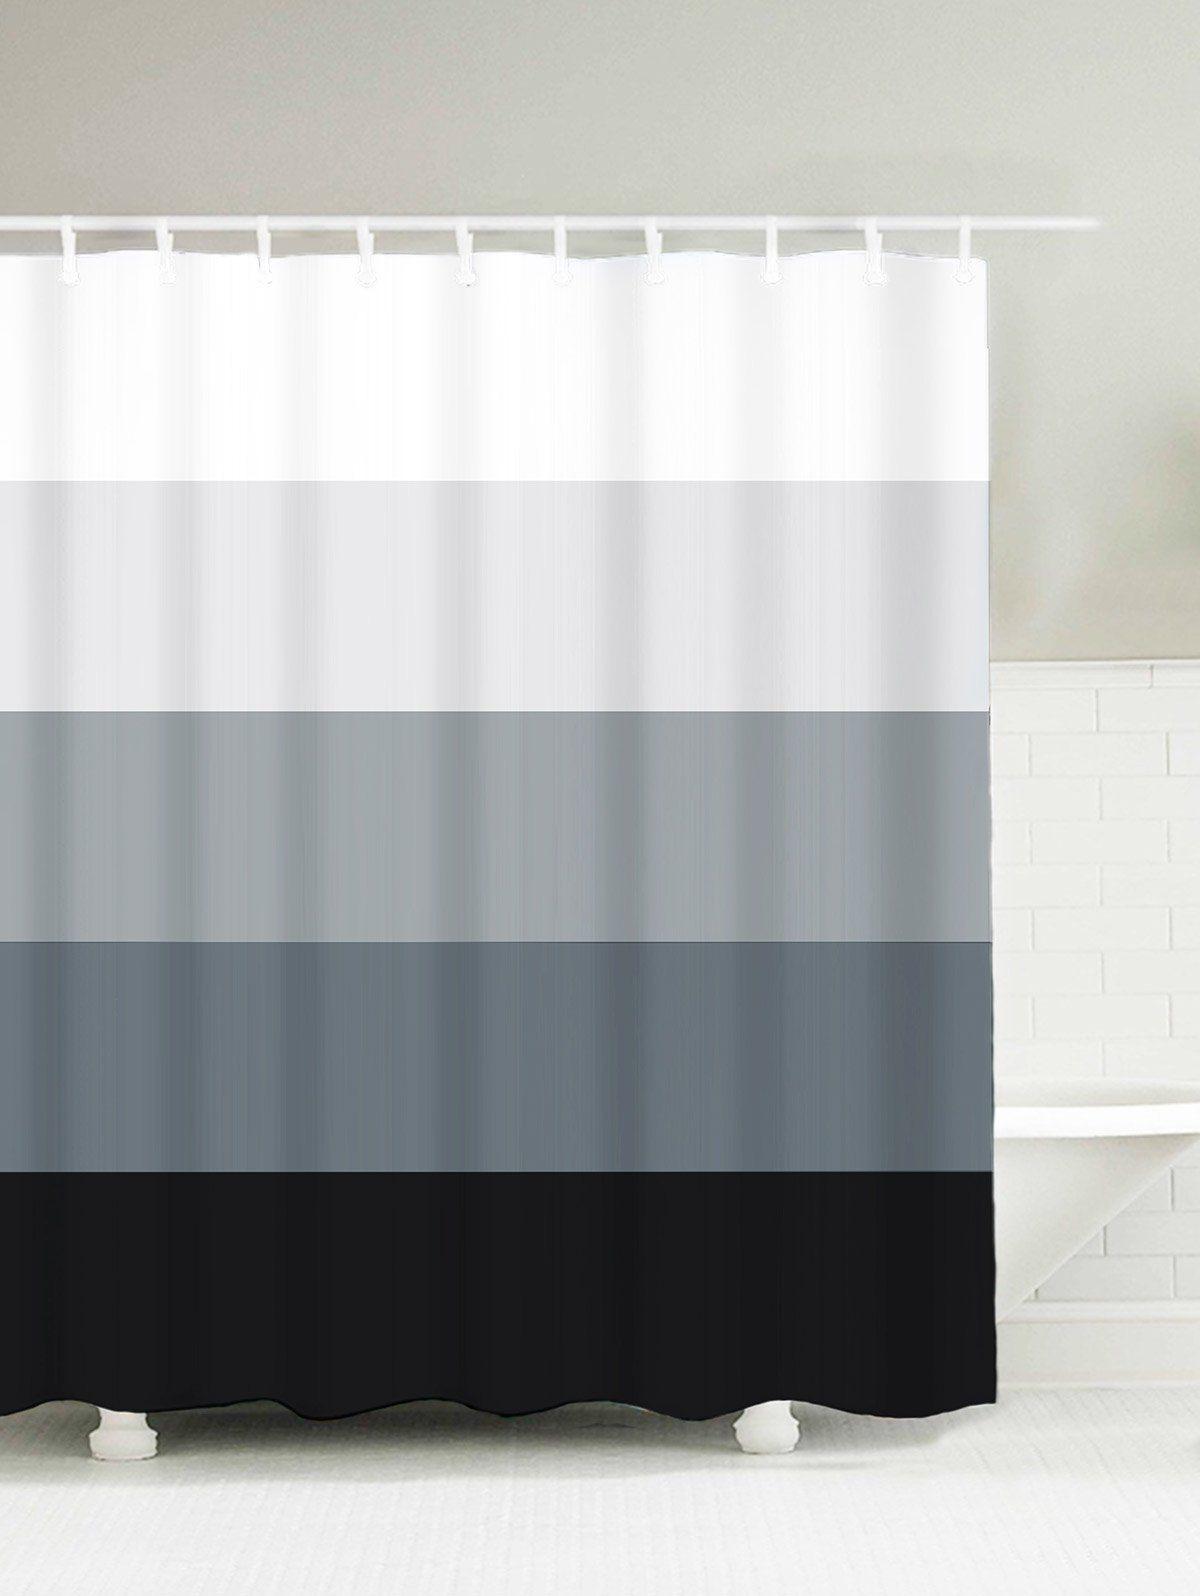 Gradient Striped Water Resistant Bath Decor Shower Curtain Black Gradual Grey 150 180cm Christmas Shower Curtains Bathroom Curtains Hookless Shower Curtain